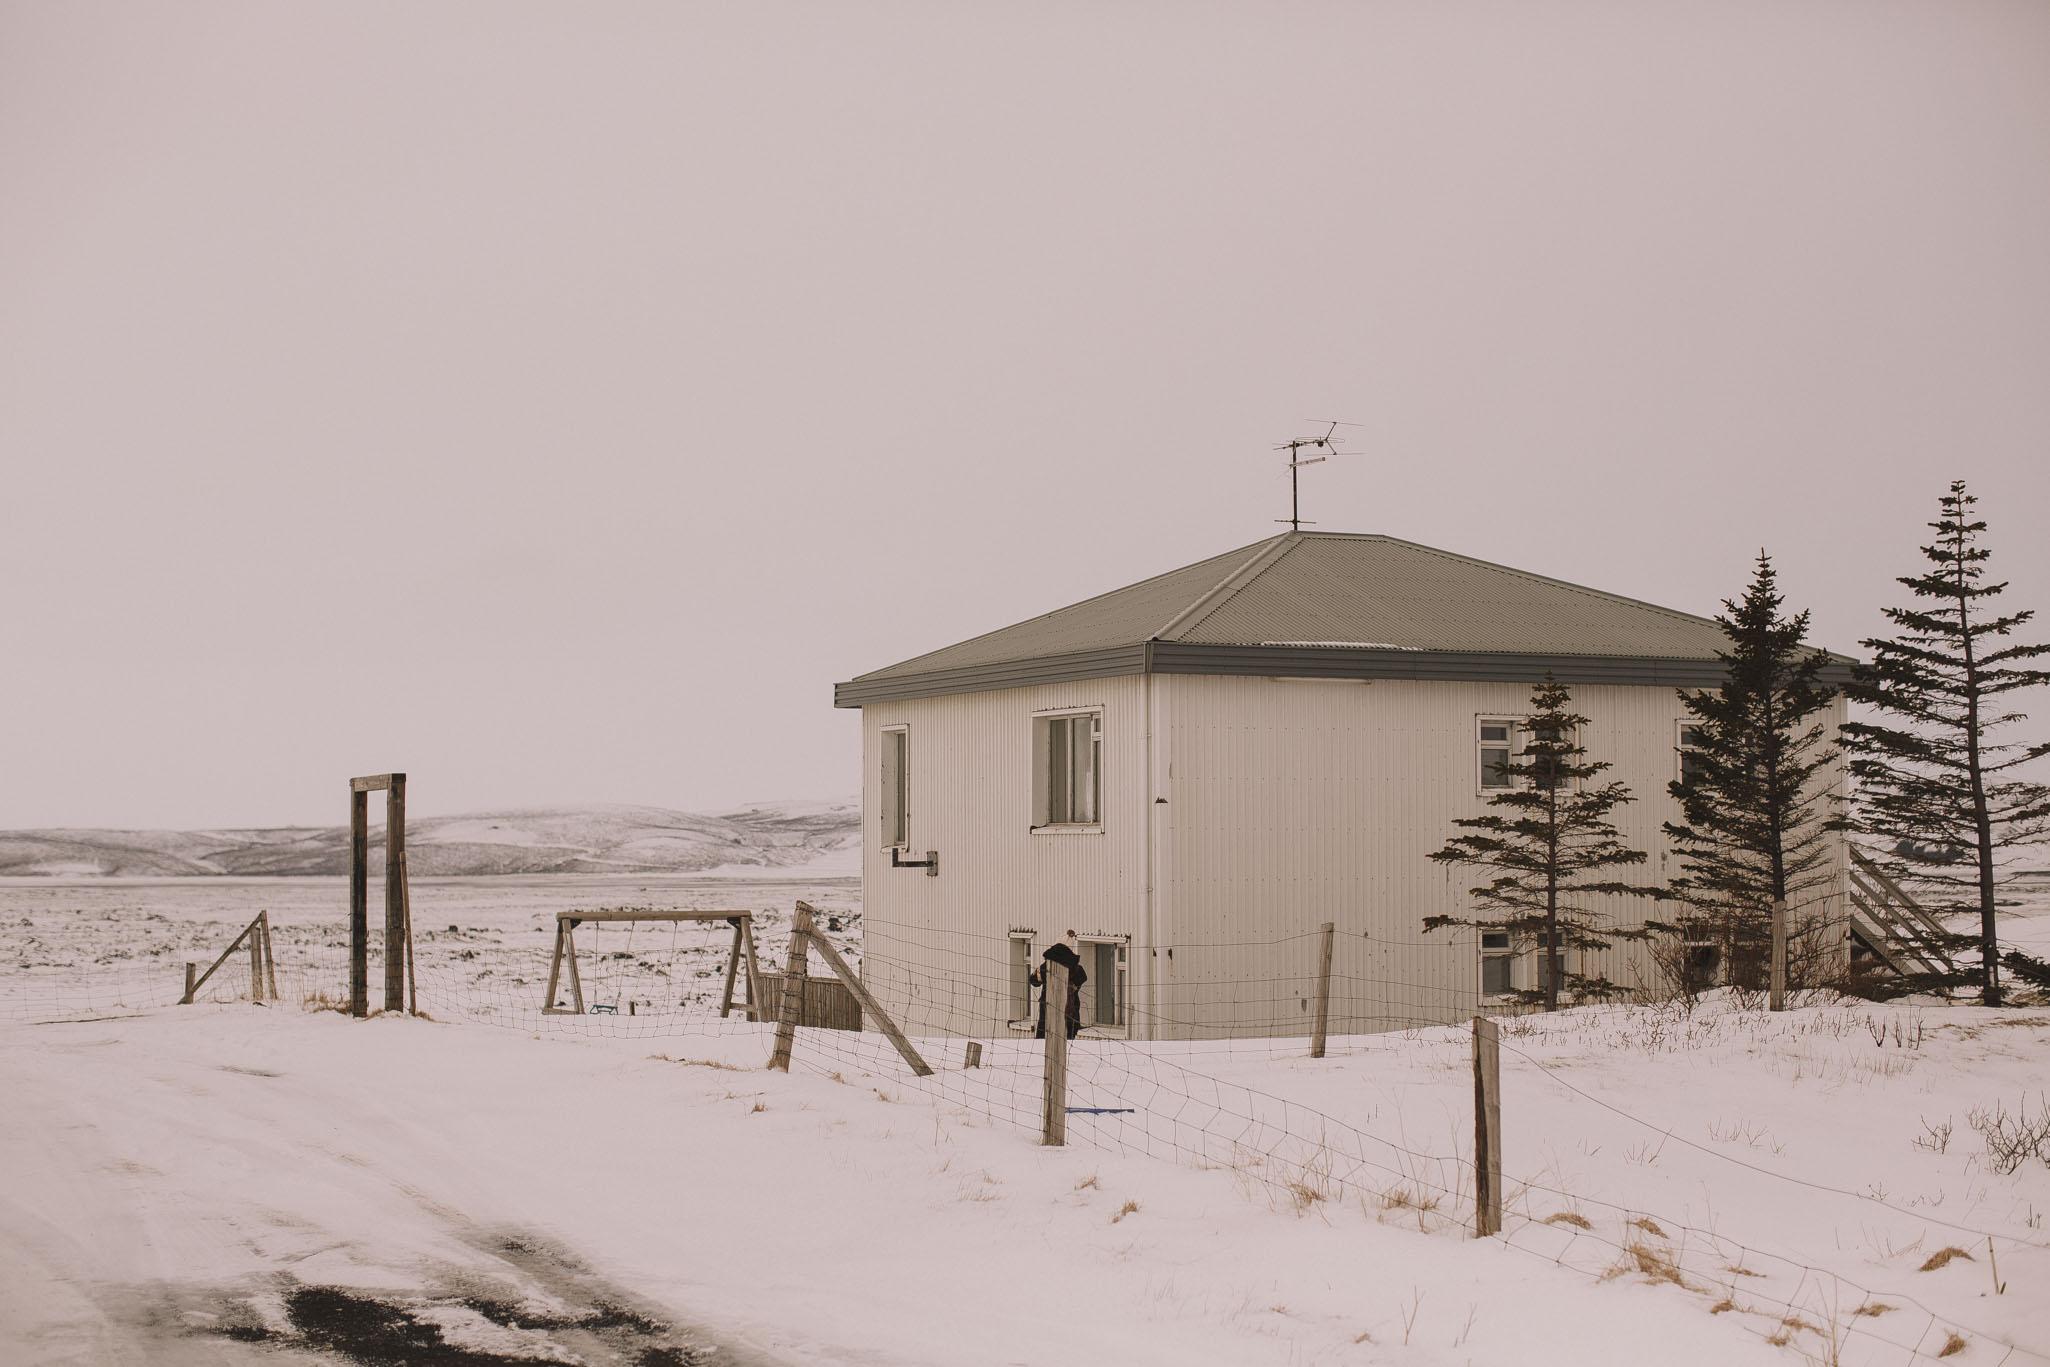 Road-trip-Islande-Iceland-Voyage-Travel-Portrait-Jérémy-Boyer-Skaftafell-11.jpg